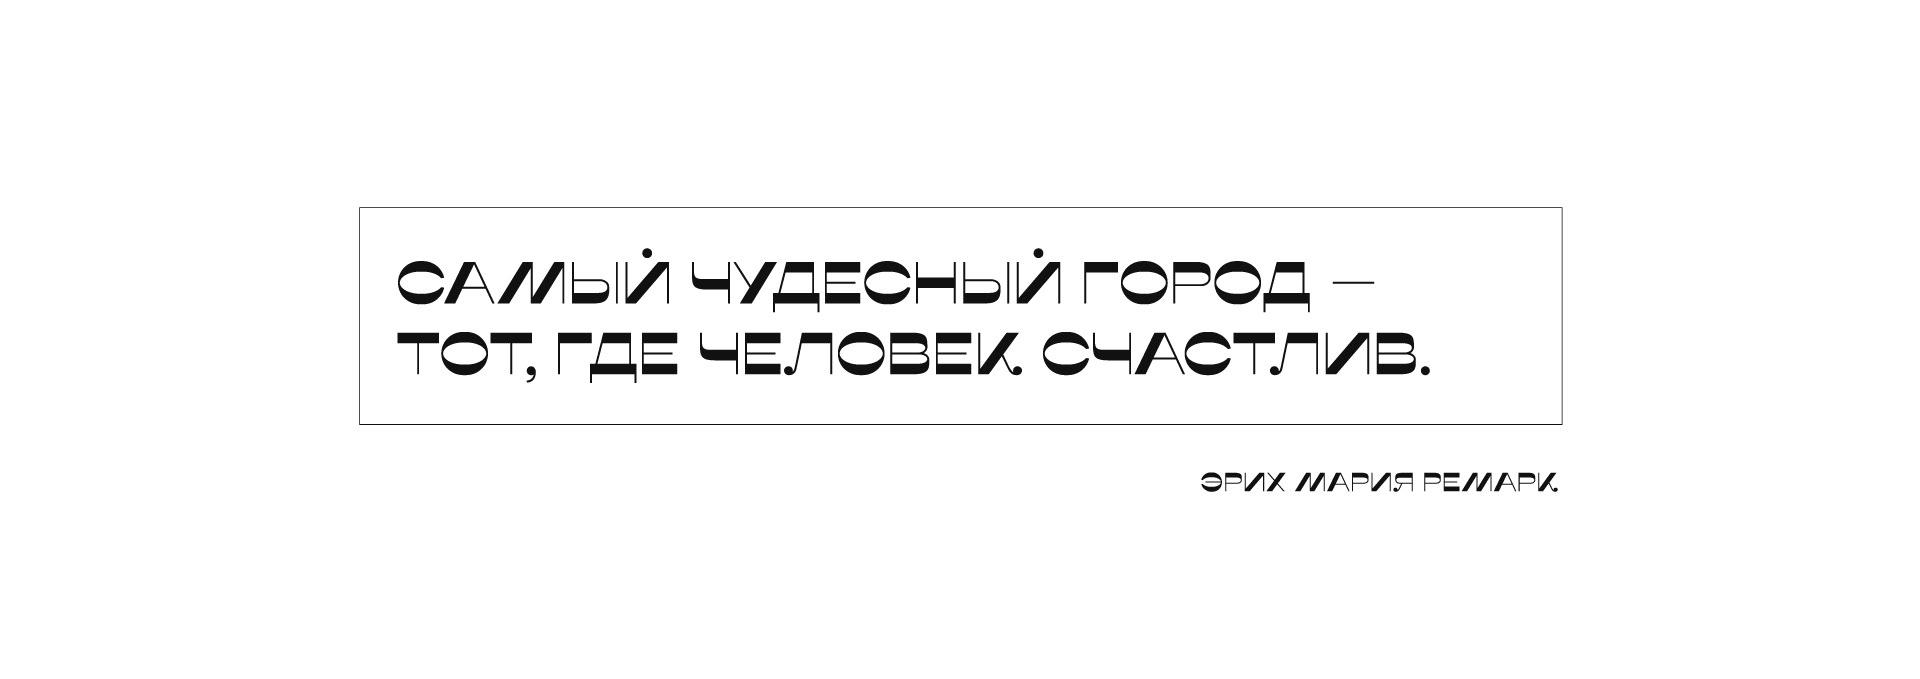 Misto Free Font - decorative-display, cyrillic